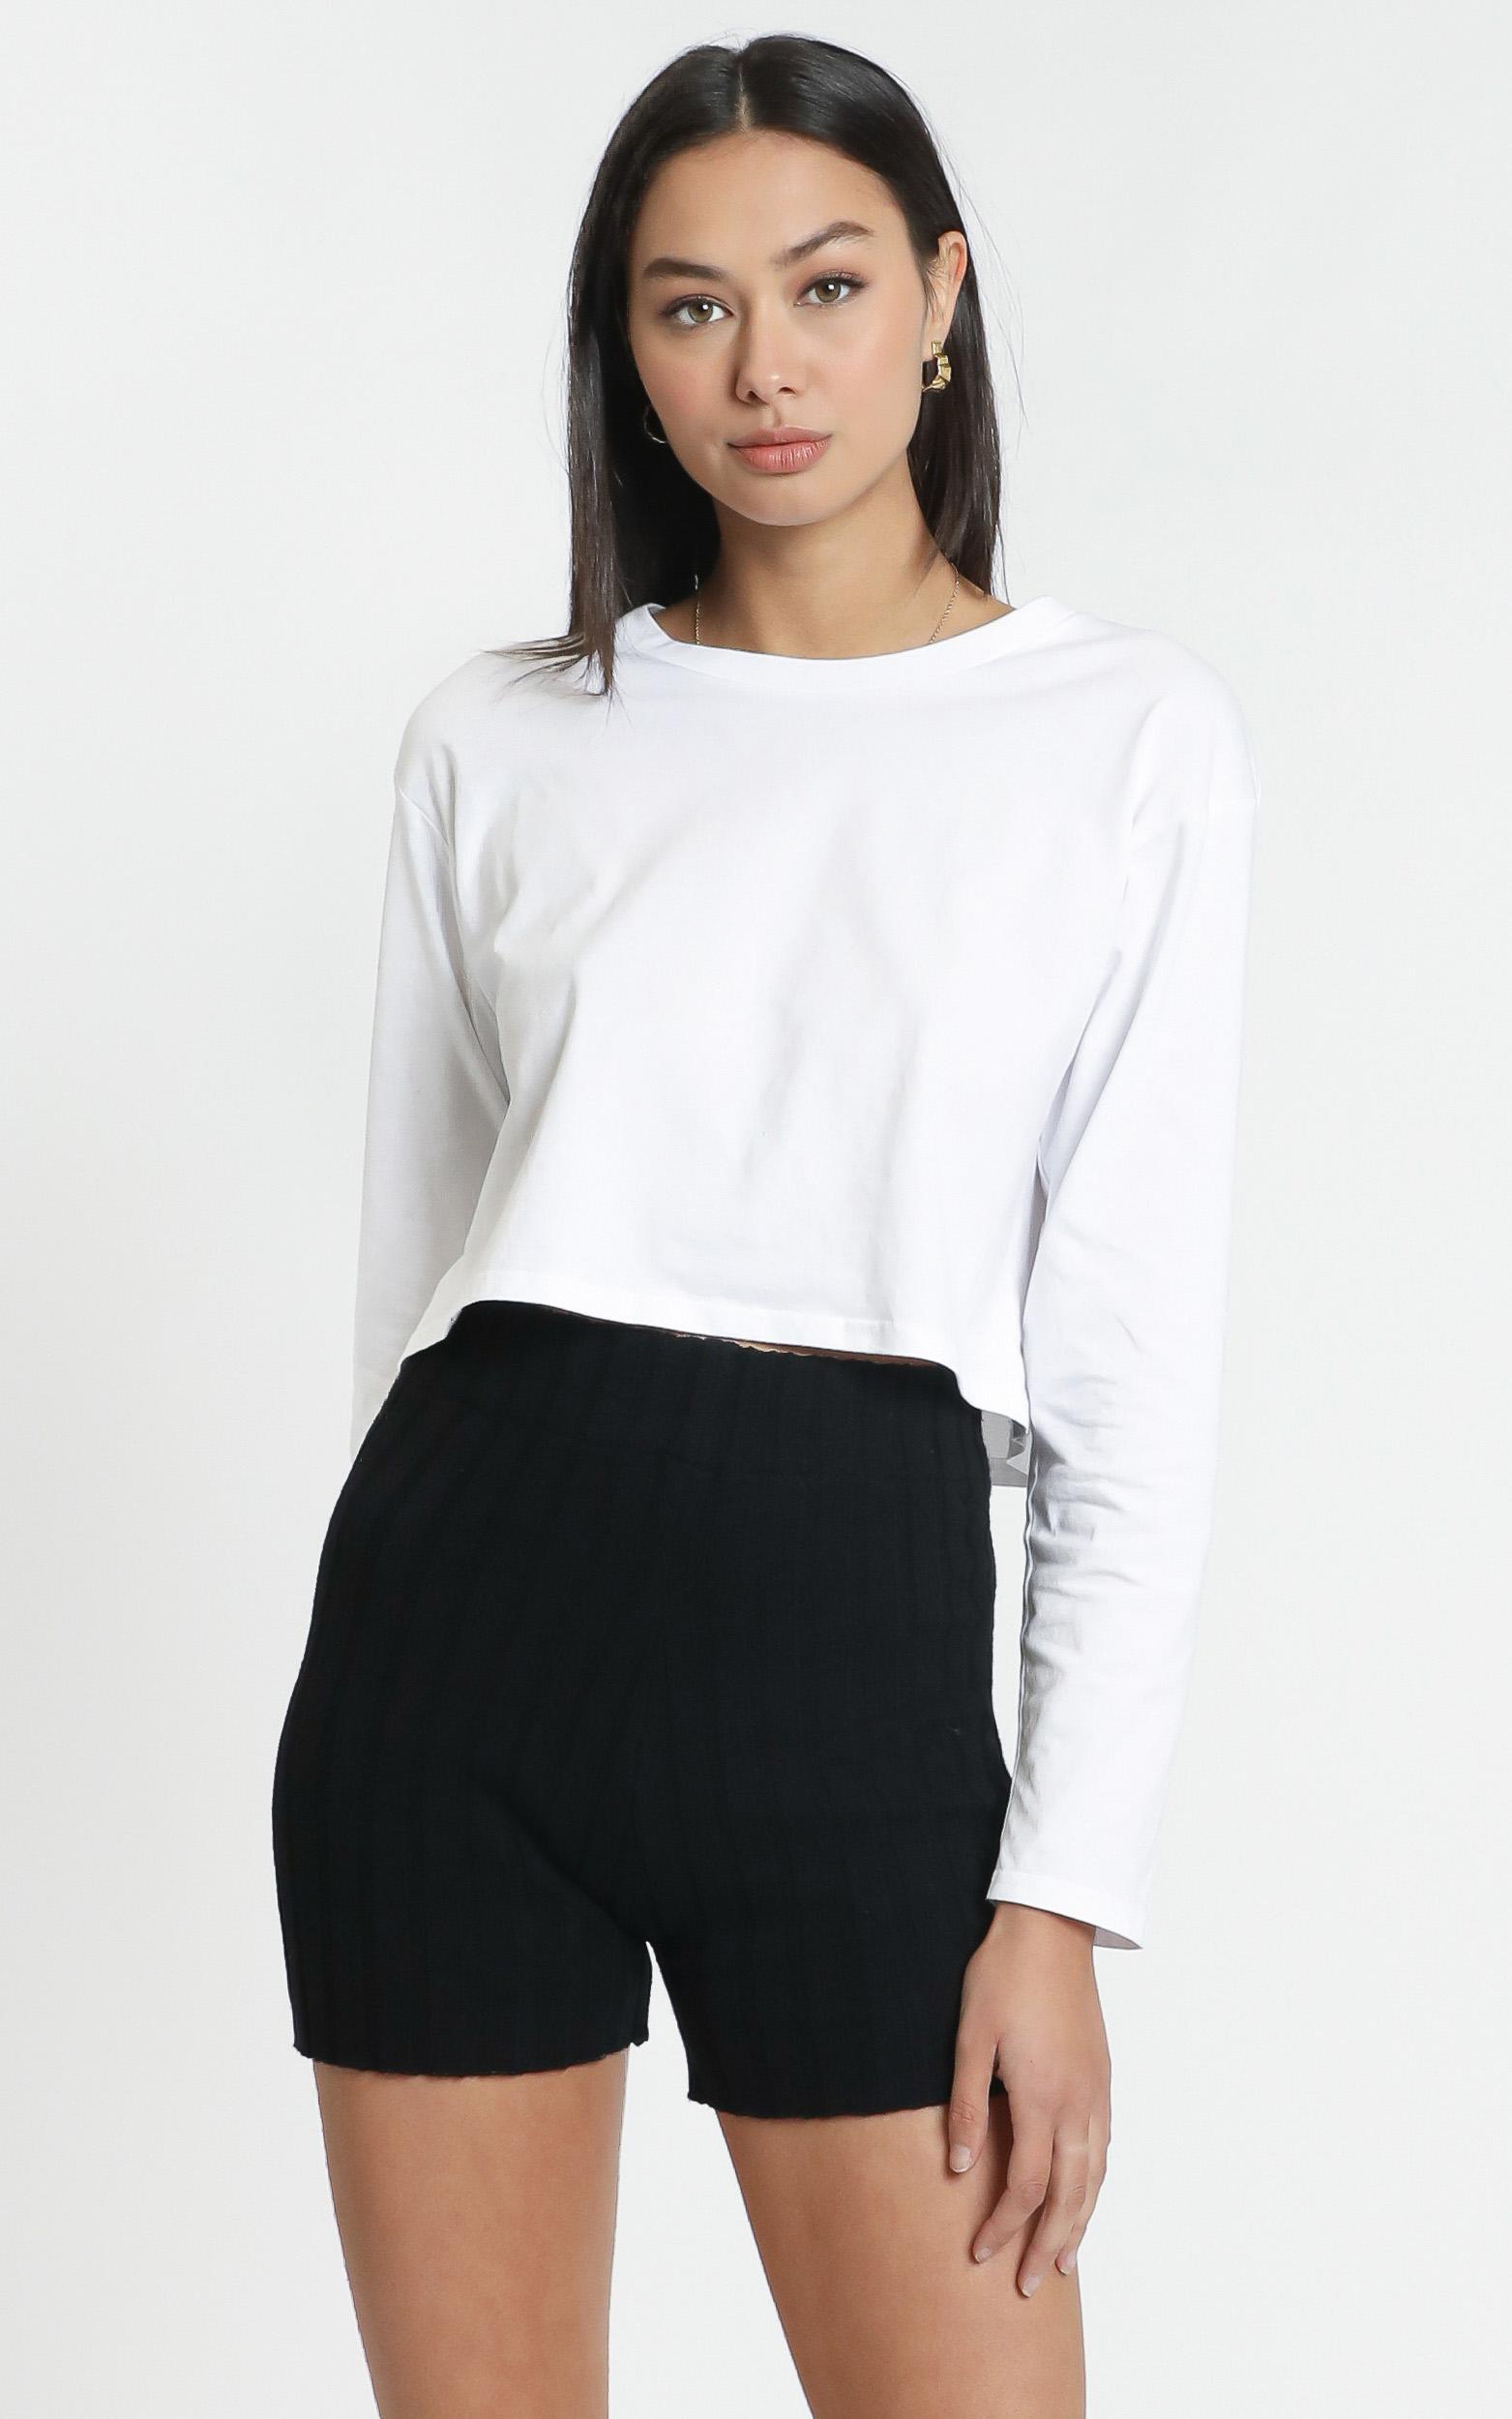 Vera Knit Shorts in Black - L, BLK1, hi-res image number null